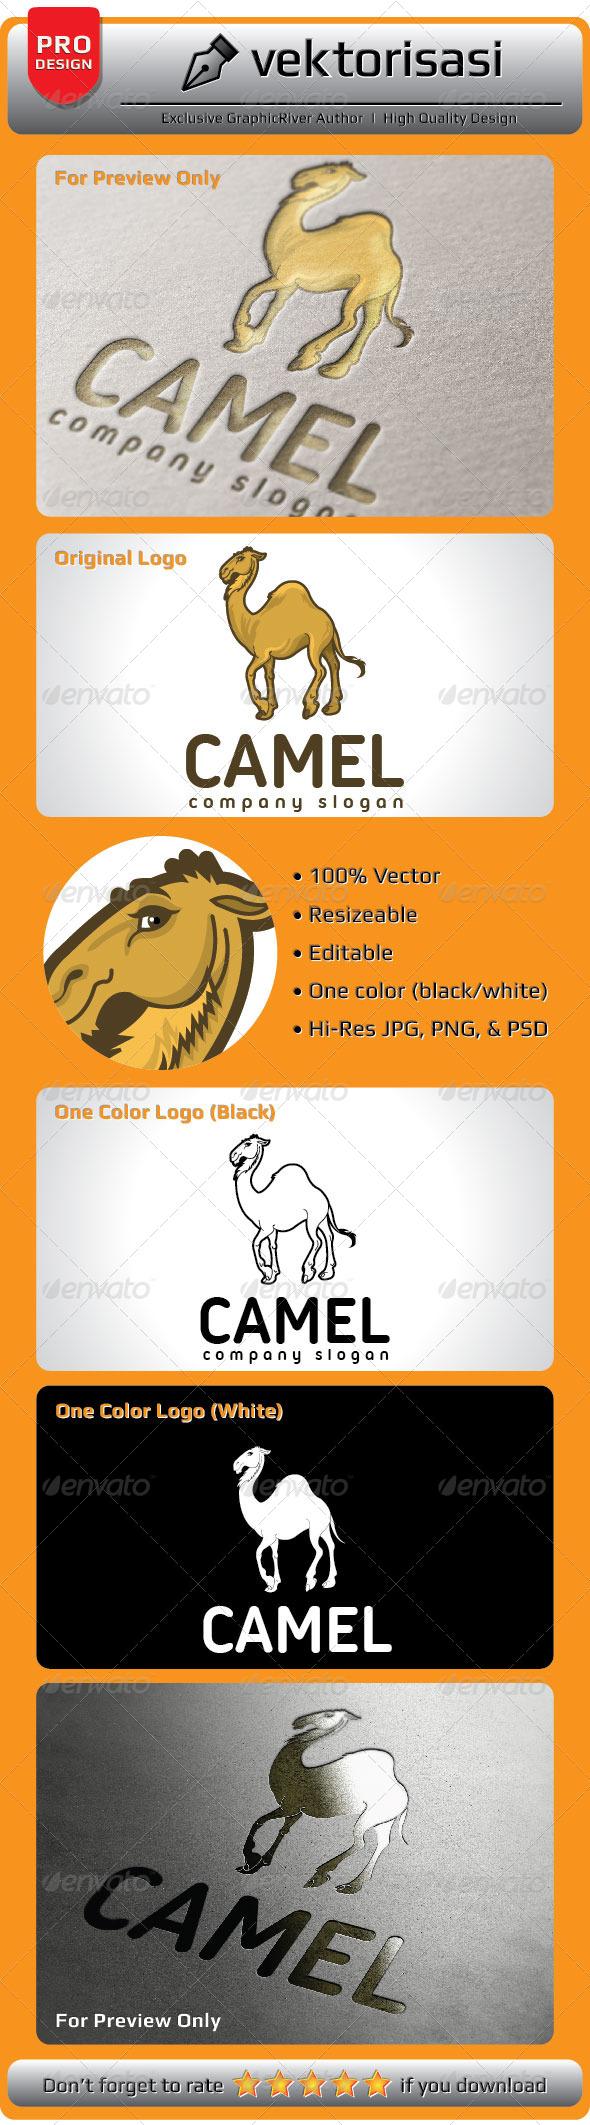 Joe Camel Cigarette Logo - Hot Girls Wallpaper   590 x 2125 jpeg 346kB